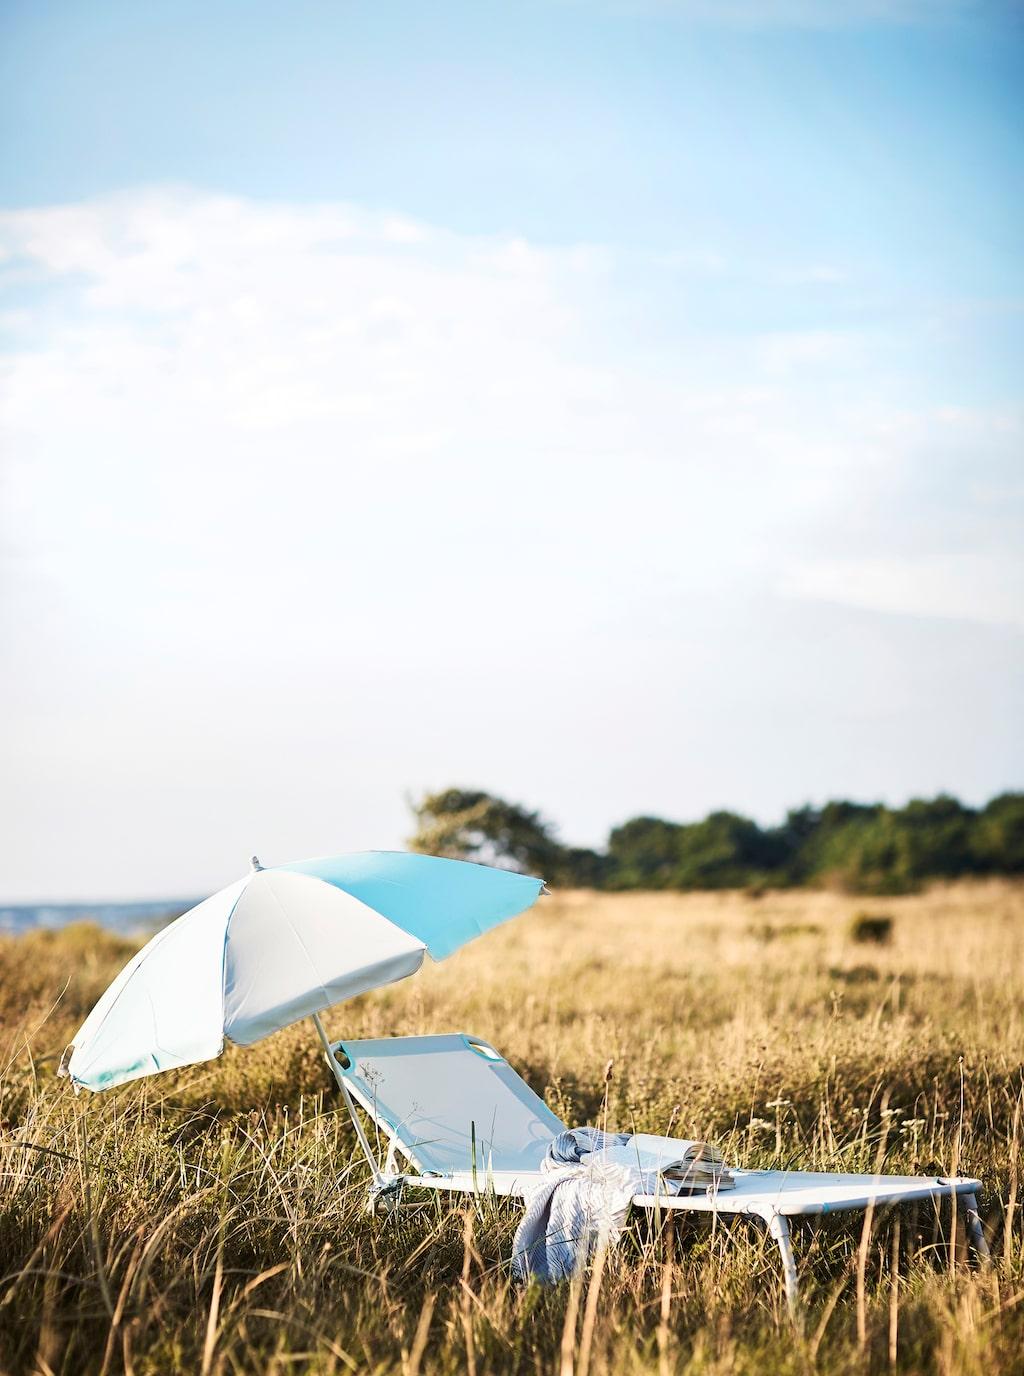 Ramsö parasoll, 70 kronor, turkos/ljusbeige. Håmö solsäng, 299 kronor, L199×B59, H28 cm. Ljusbeige.